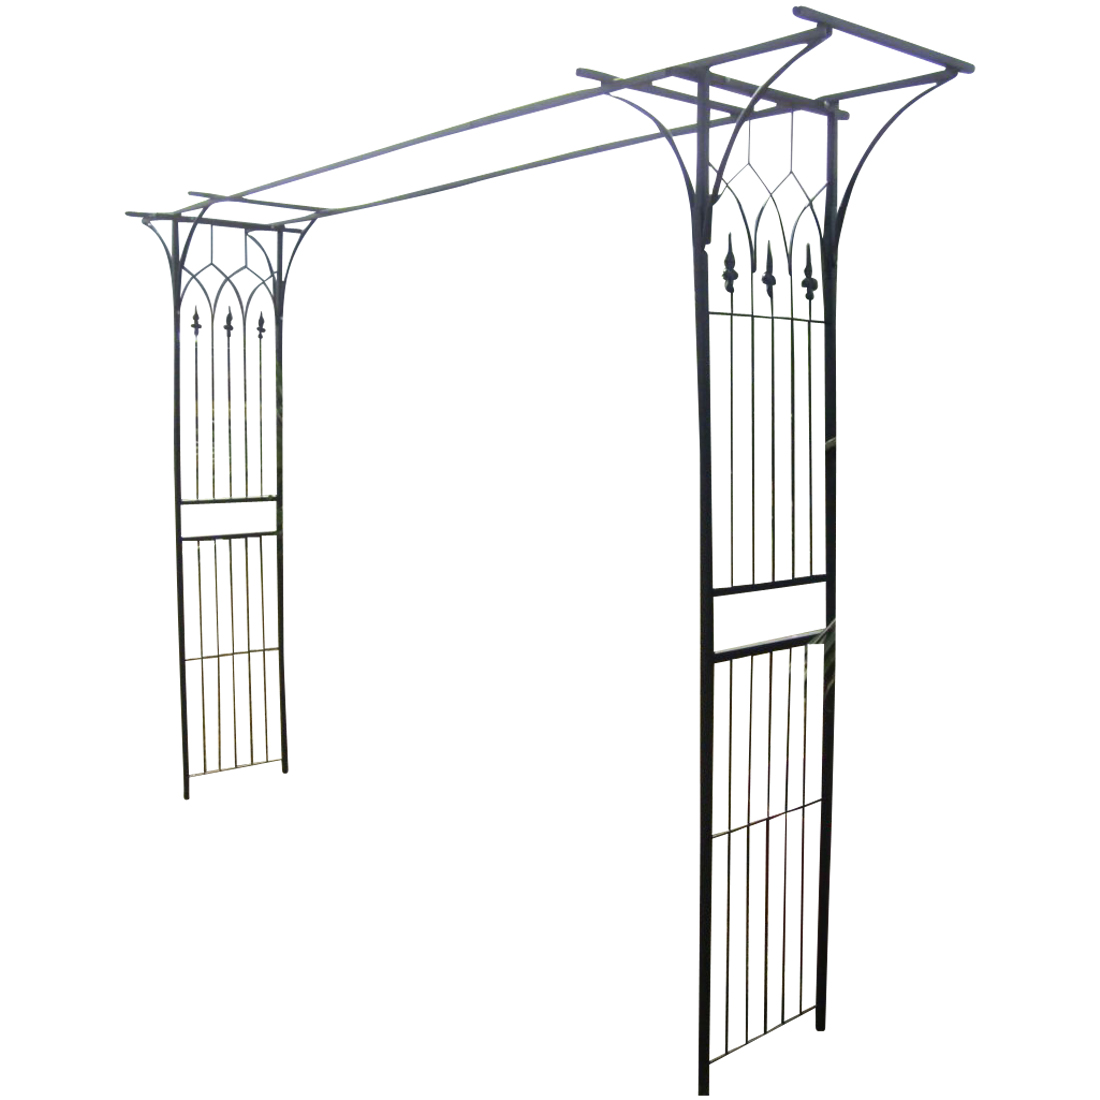 eleganter xxl rosenbogen pergola rosenbogen rankhilfe aus metall schwarz alles f r. Black Bedroom Furniture Sets. Home Design Ideas